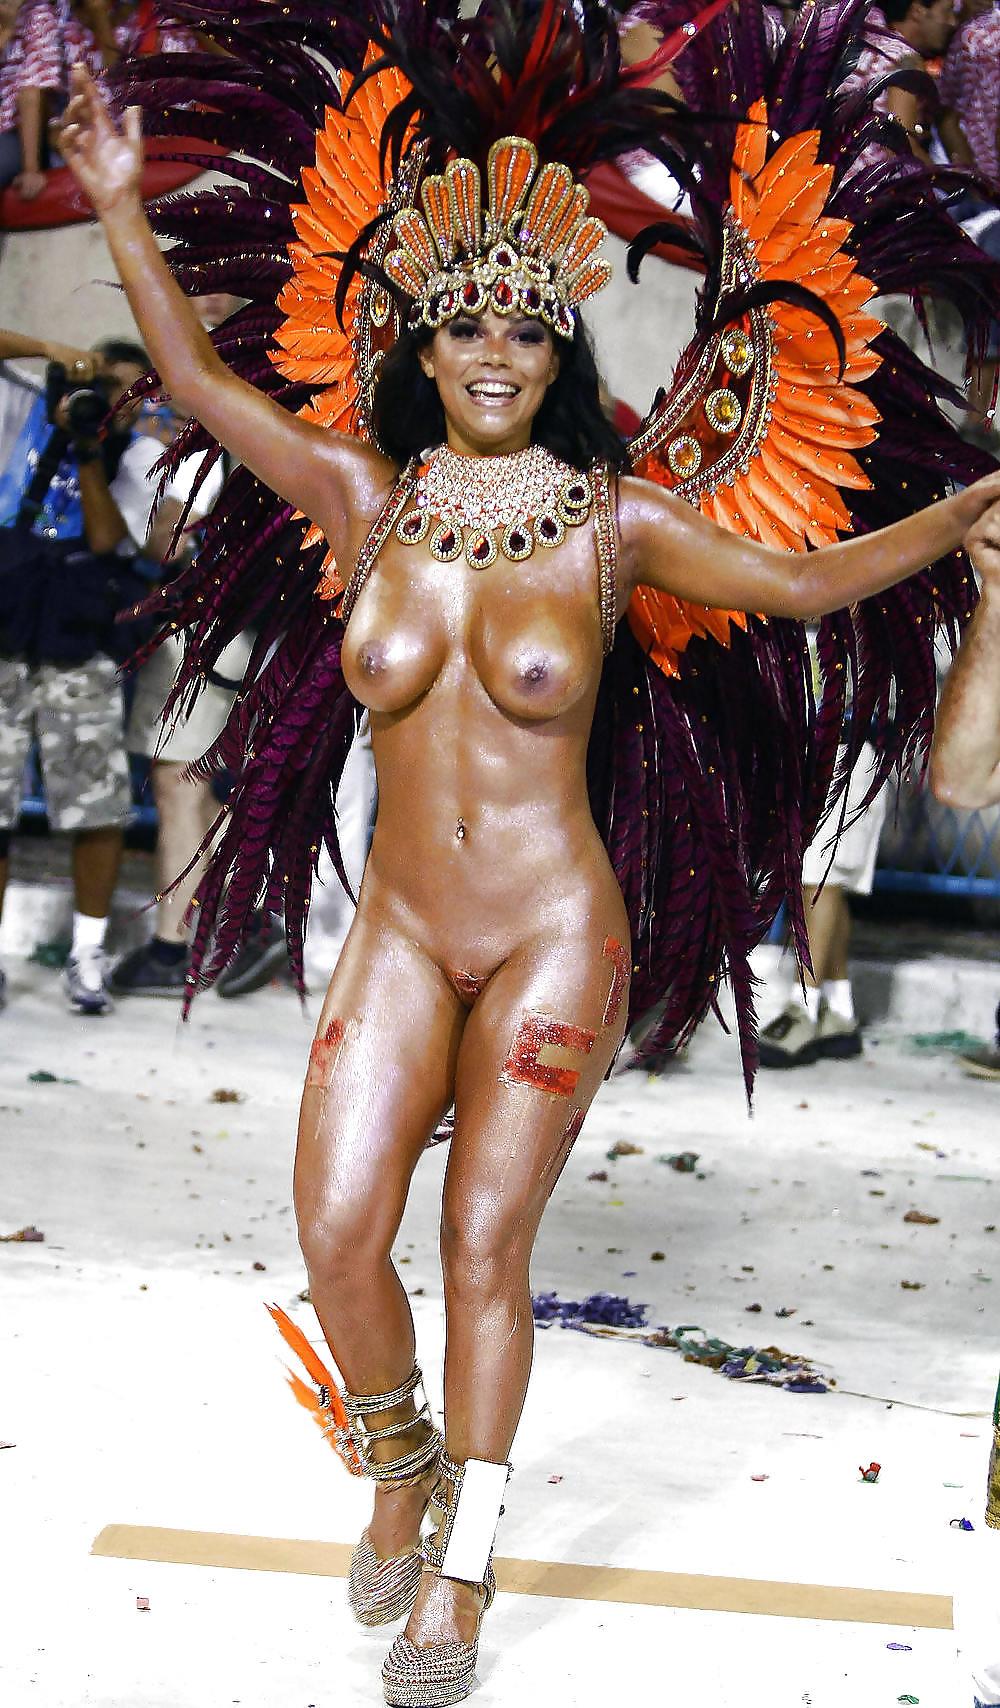 Смотреть онлайн карнавал приколы голых баб фото 617-683